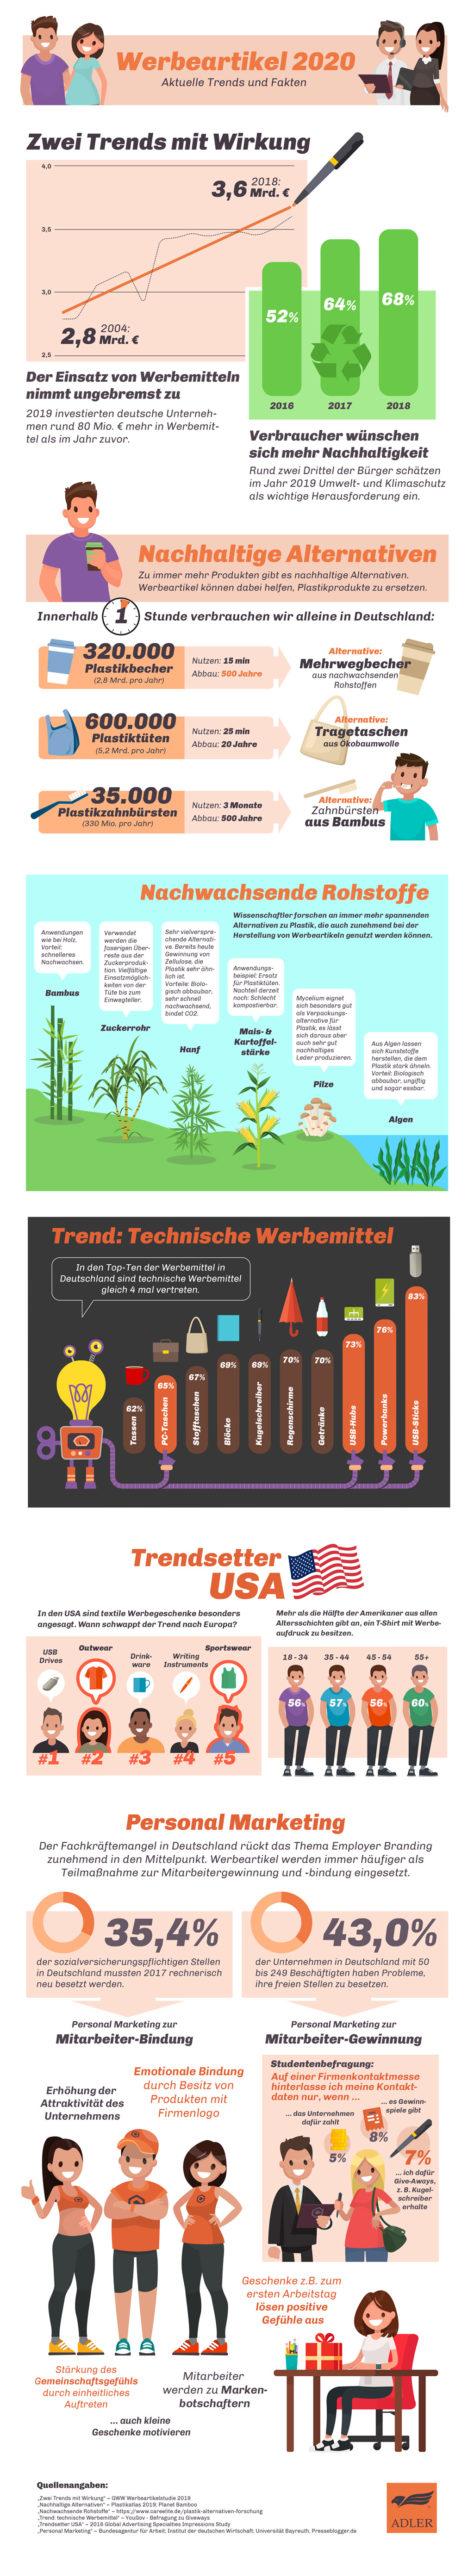 Infografik Werbeartikeltrends 2020